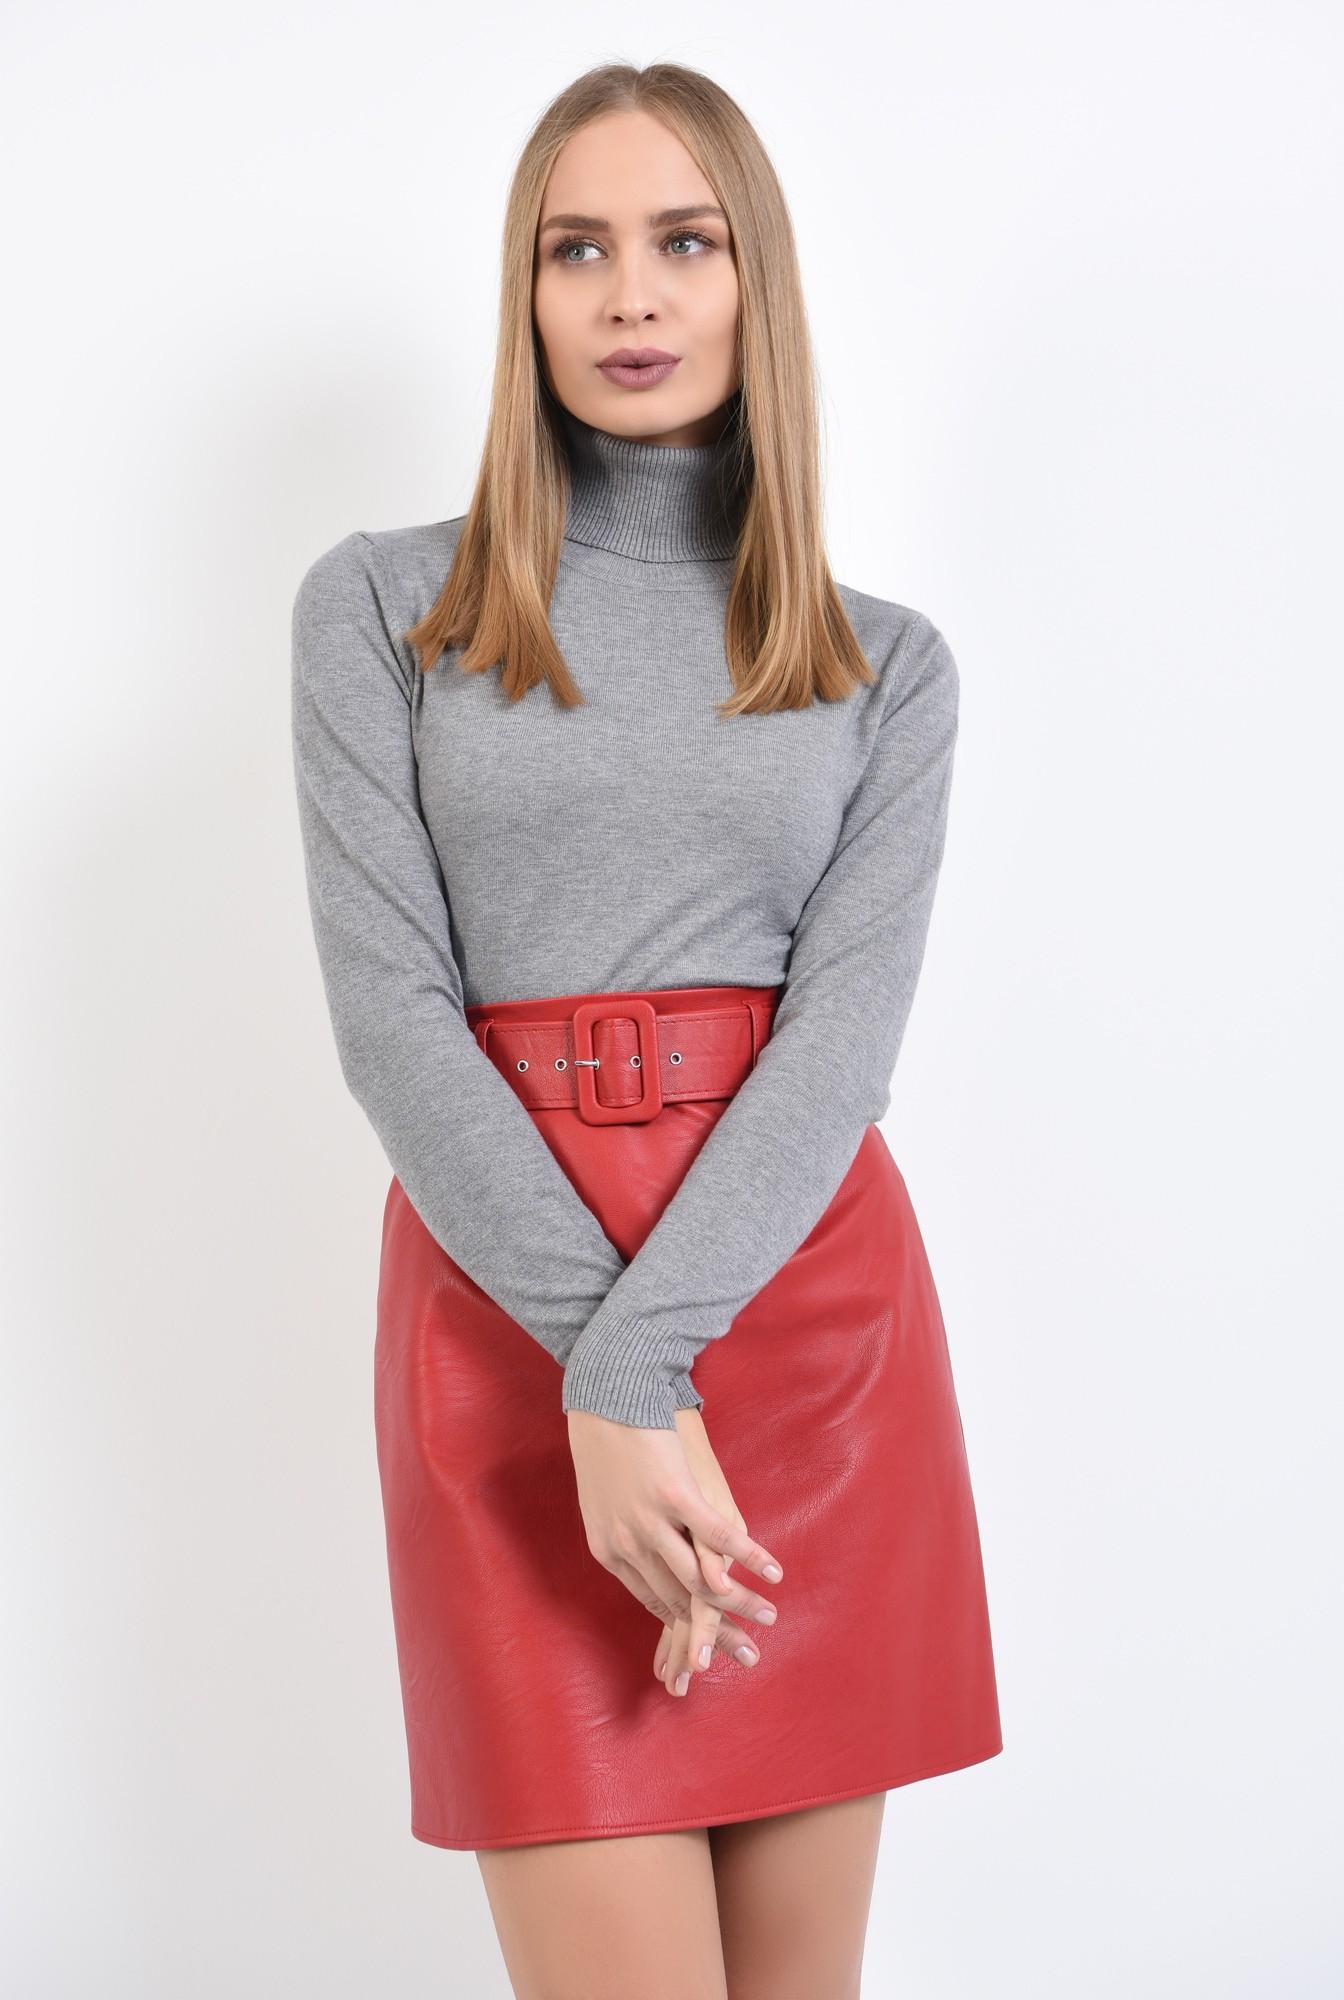 0 - pulover tip maleta, gri, borduri reiate, guler inalt, bluza tricotata